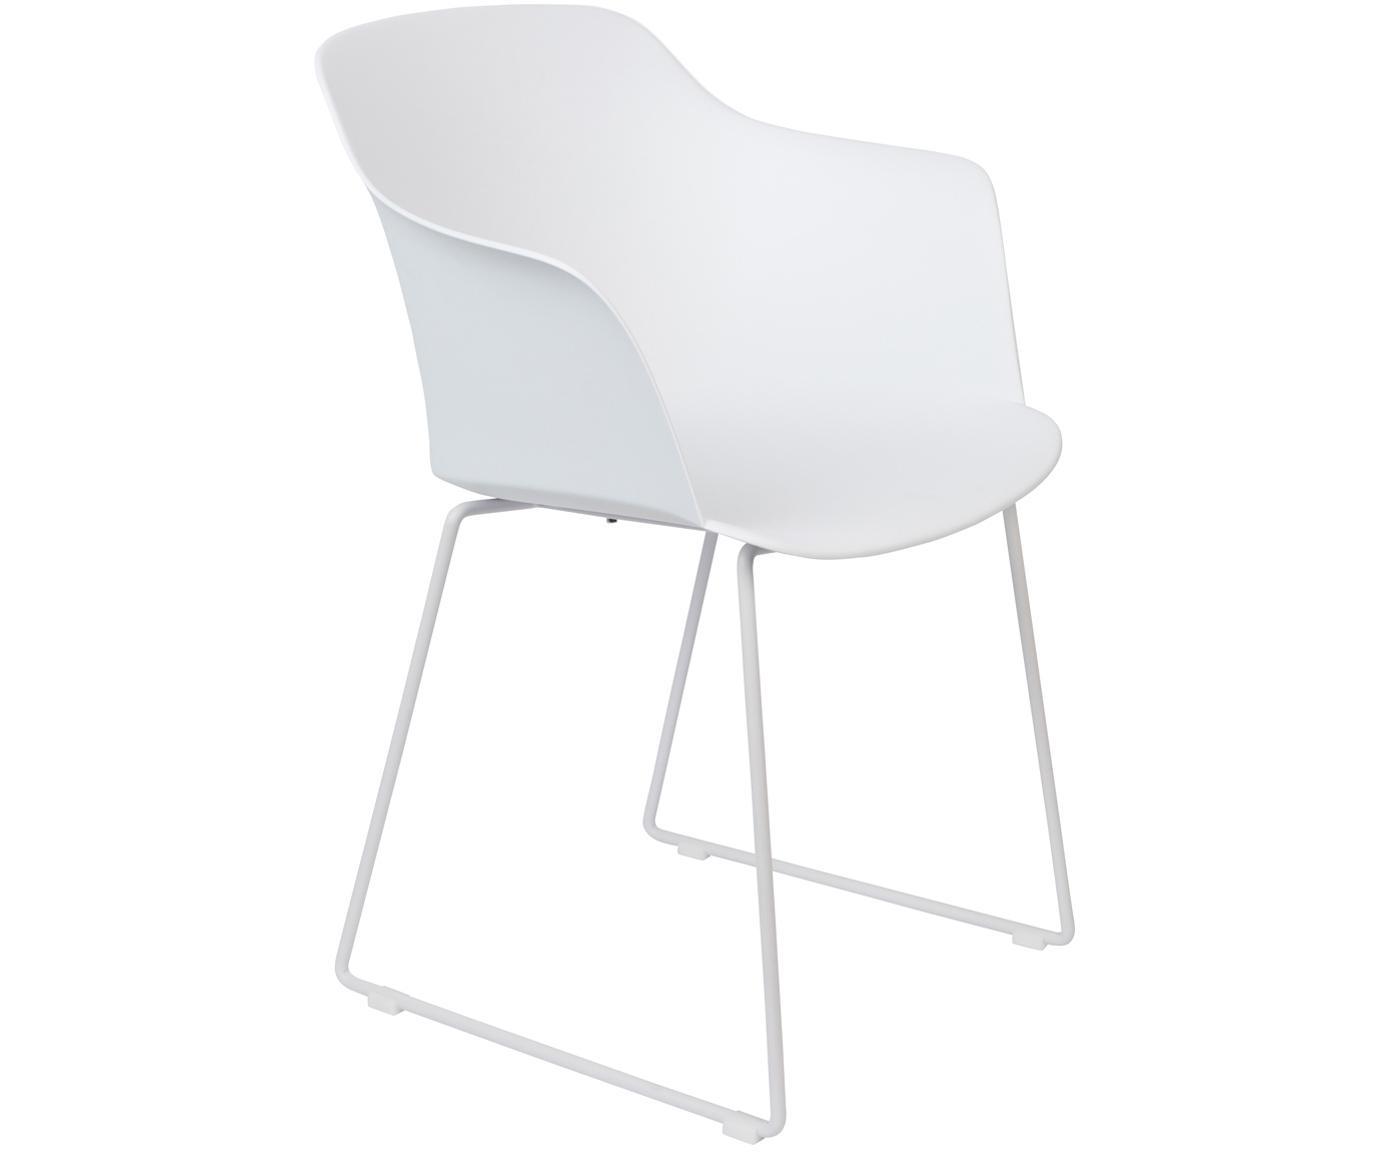 Sedia con braccioli Storm 2 pz, Seduta: polipropilene, Gambe: acciaio verniciato a polv, Bianco, Larg. 58 x Prof. 54 cm